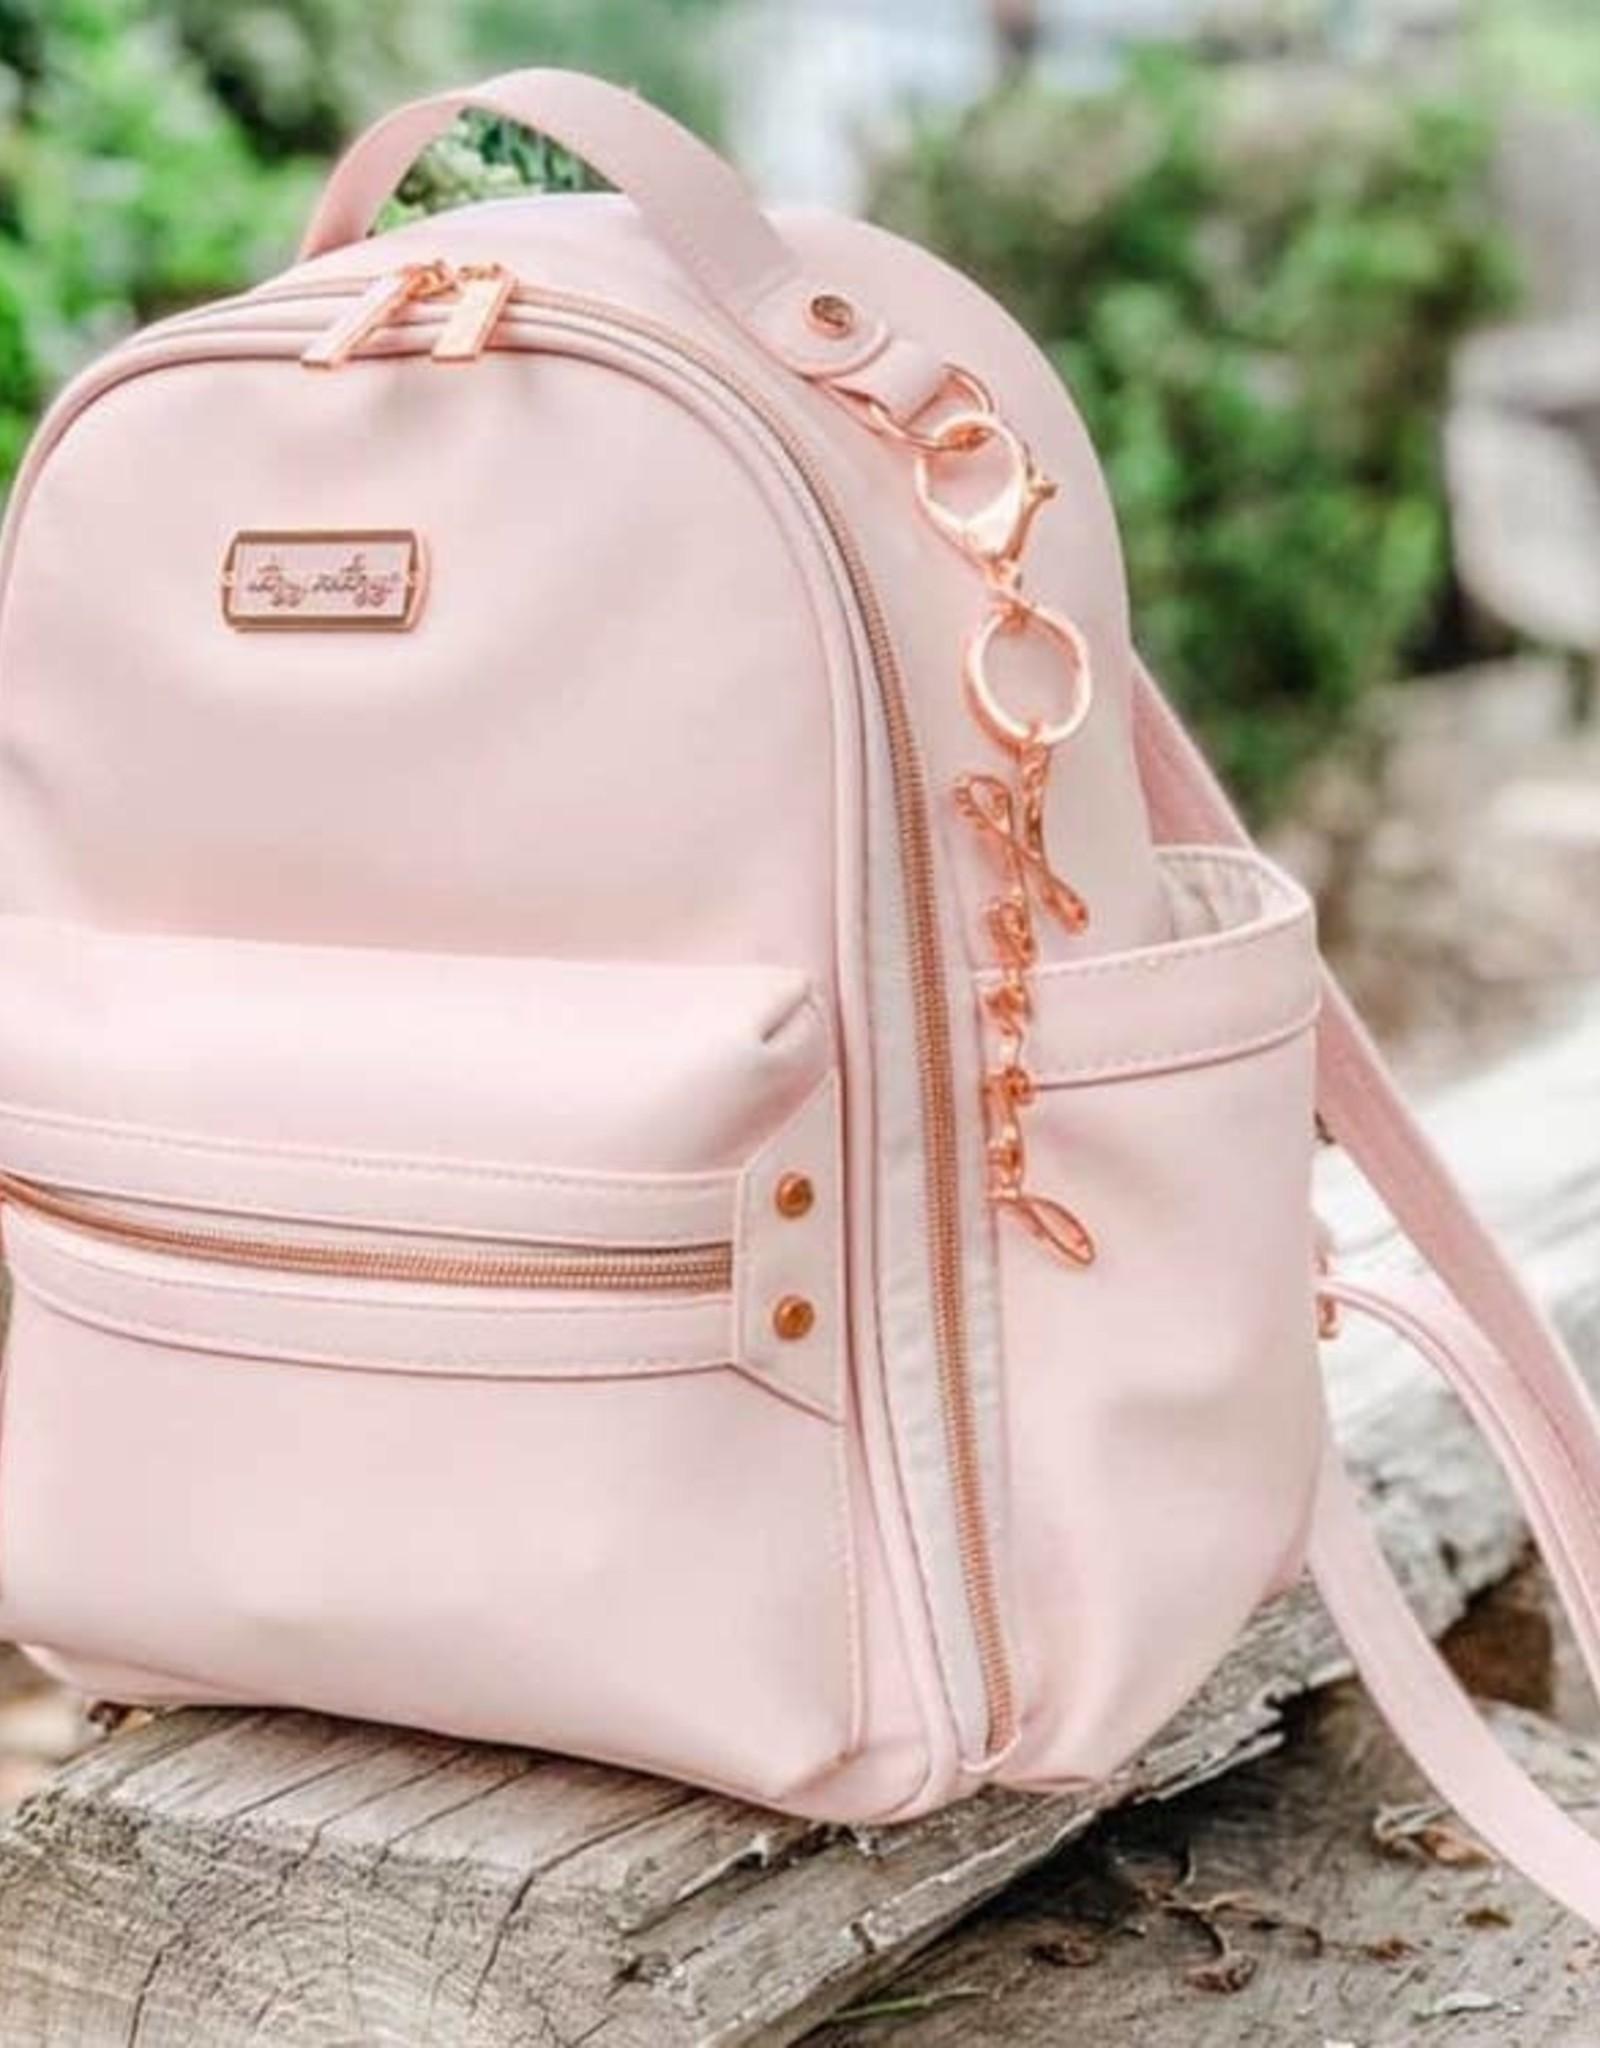 Itzy Ritzy Blush Itzy Mini Diaper Bag Backpack